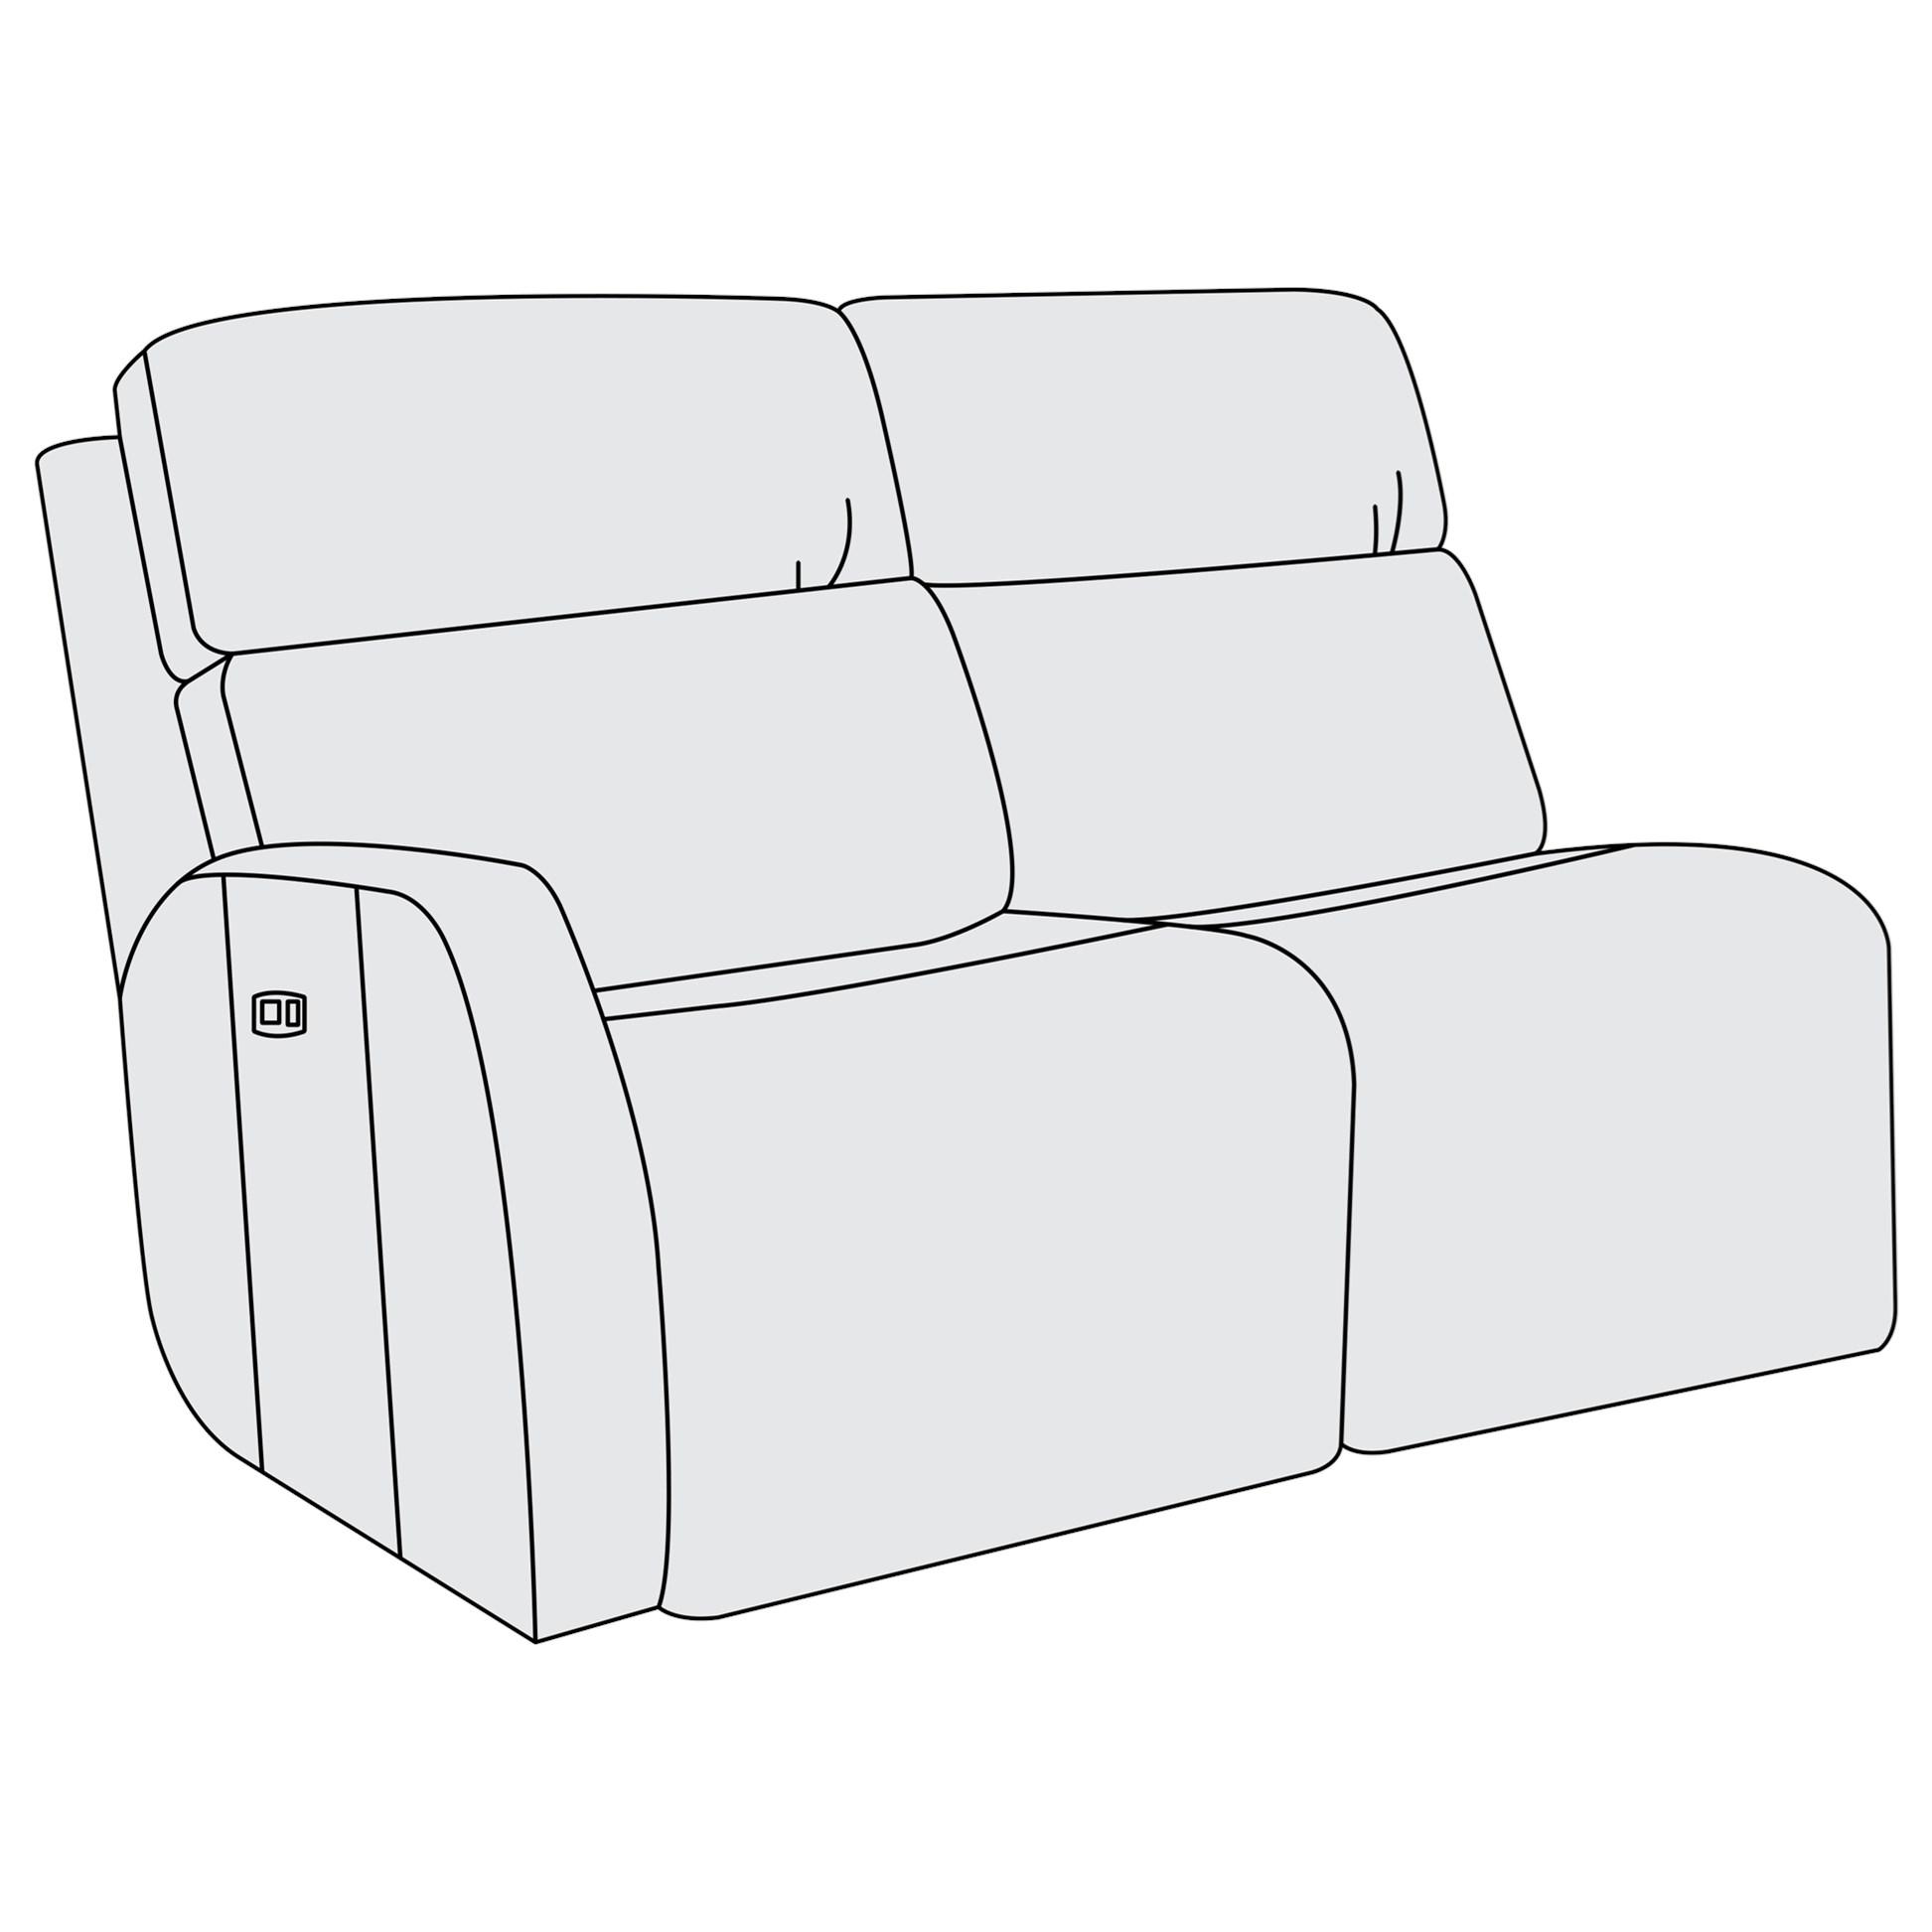 Sensational Bernhardt Aaron Leather Left Arm Power Motion Loveseat Pabps2019 Chair Design Images Pabps2019Com